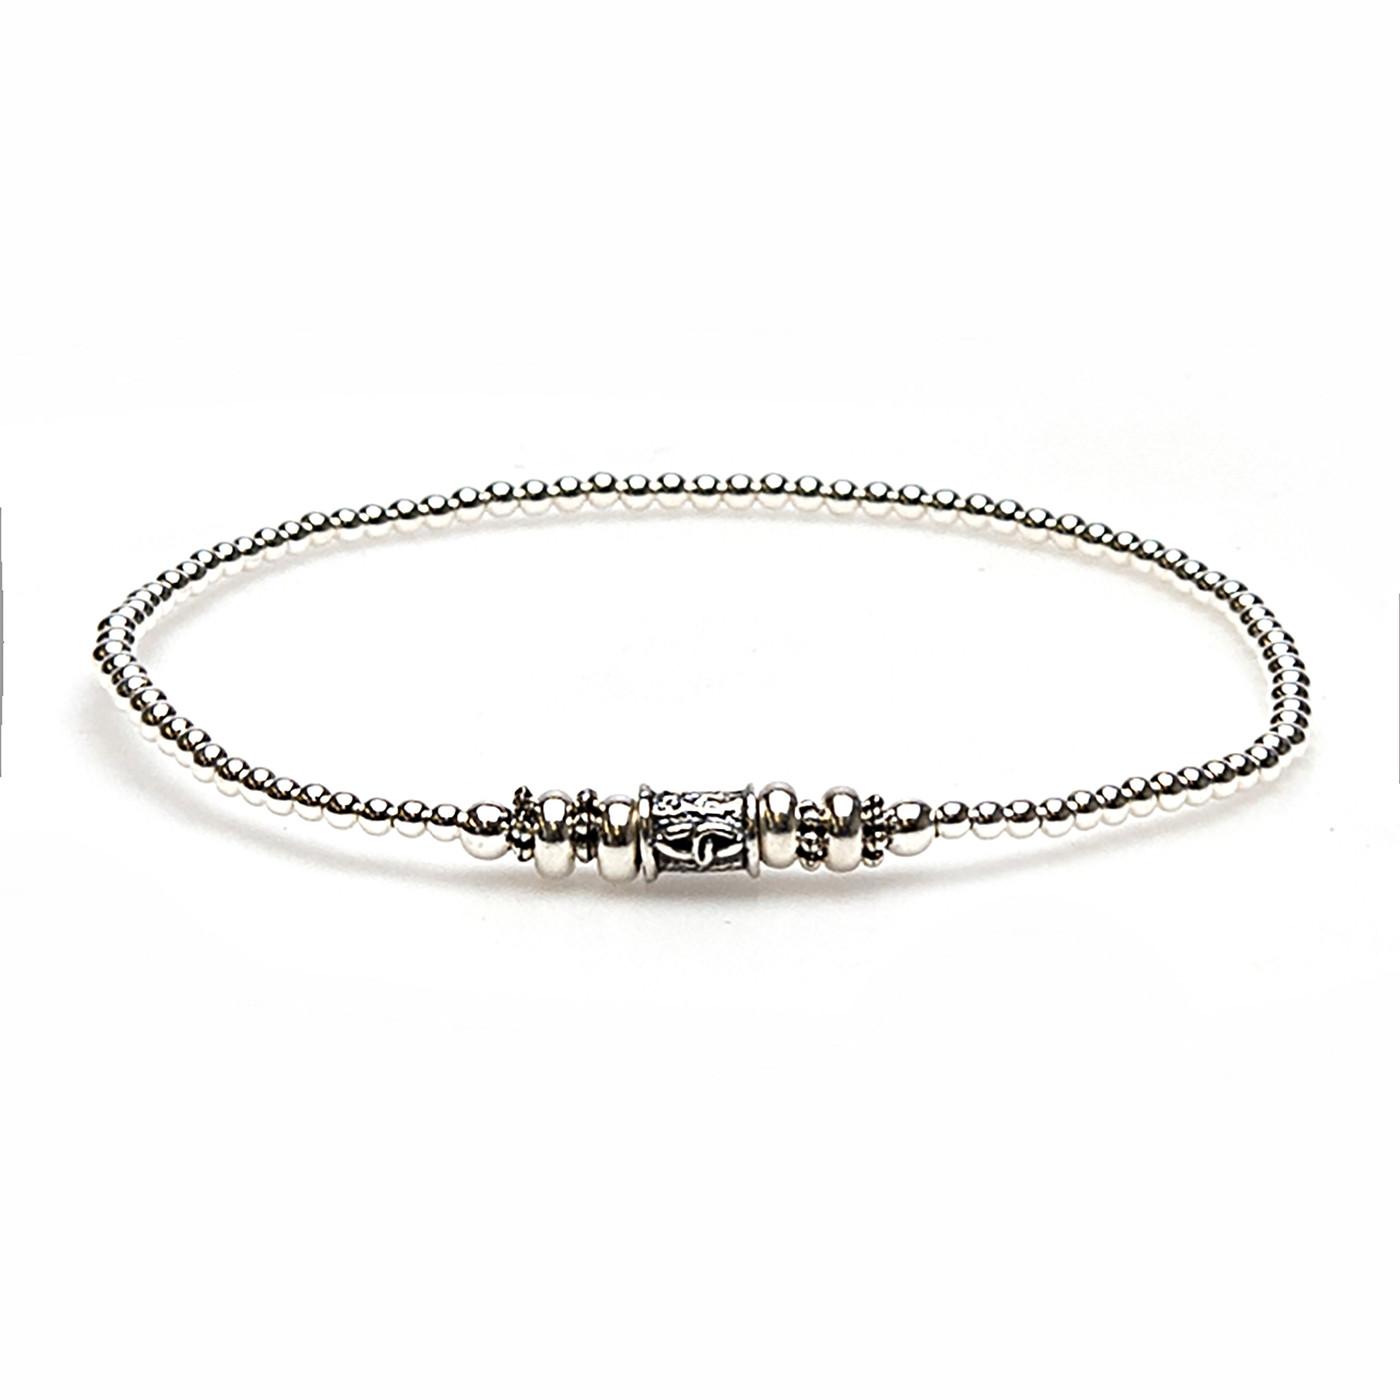 Karma Jewelry - 925 STERLING ZILVEREN BALISTYLE ARMBAND 92362